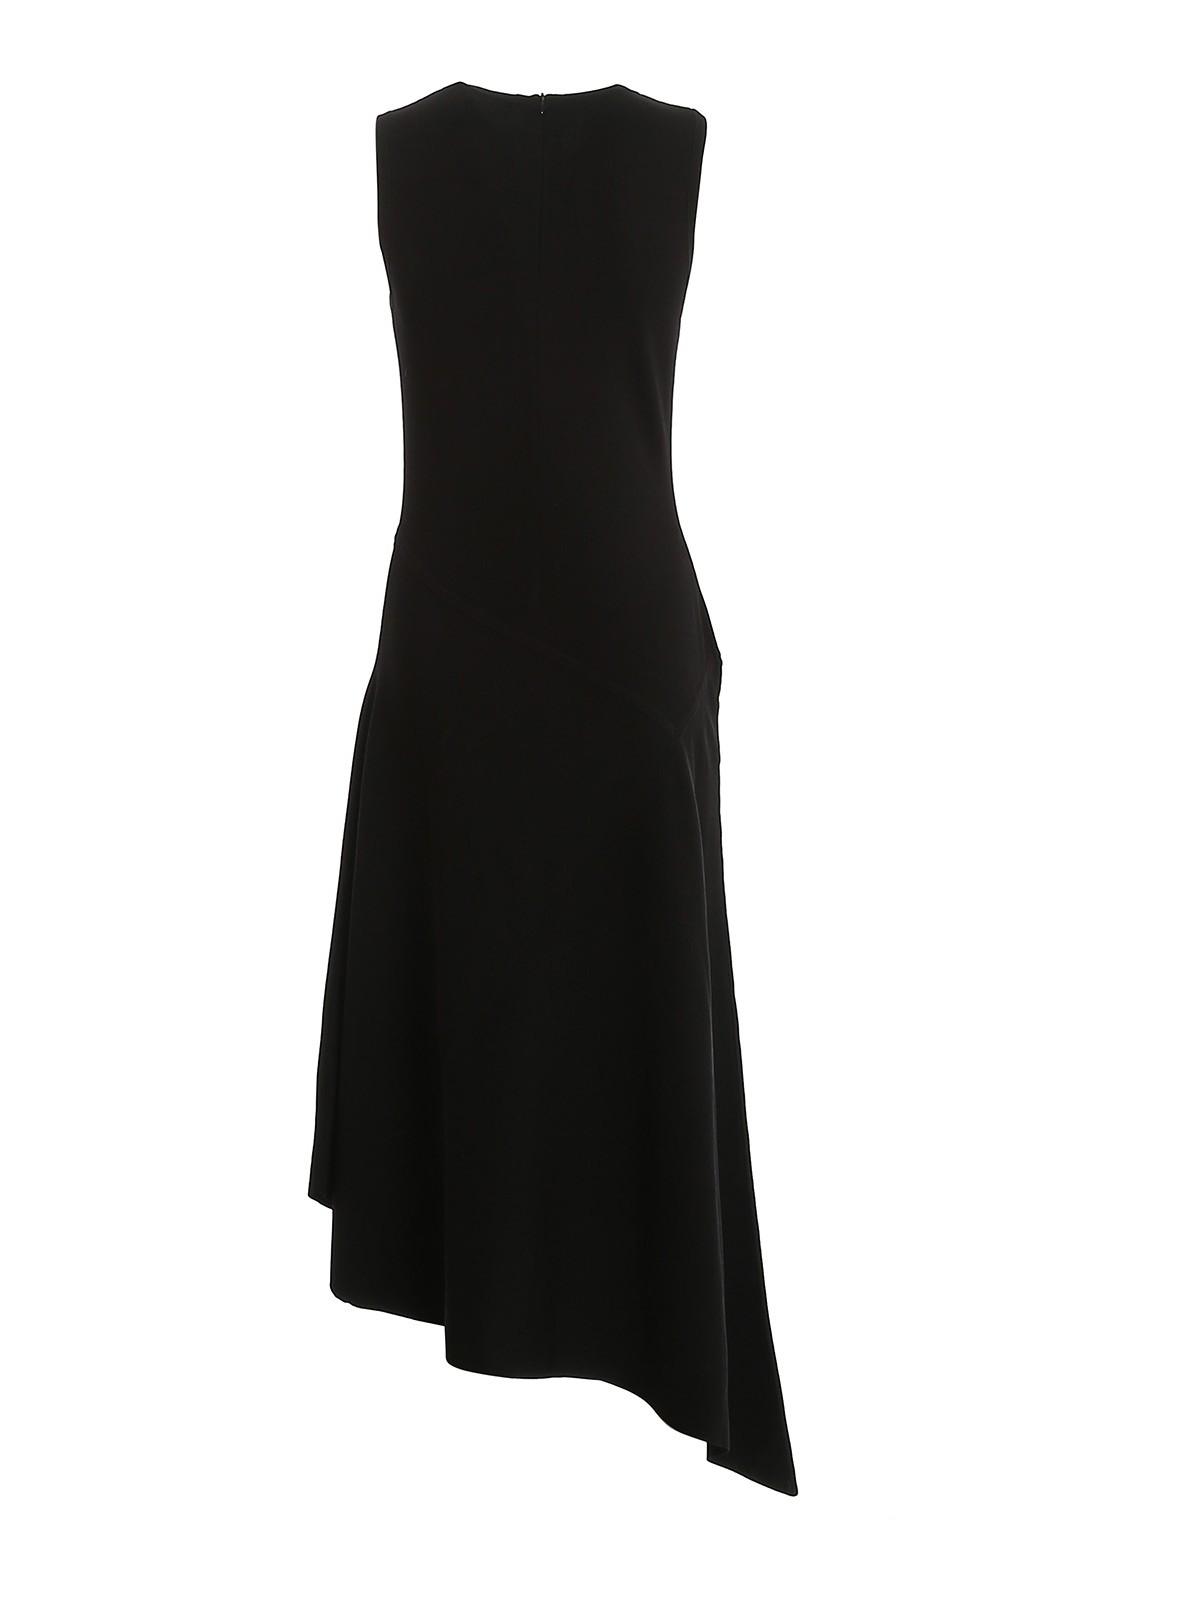 Michael Kors Knielanges Kleid Schwarz Knielange Kleider Mu08zrtbvcblack